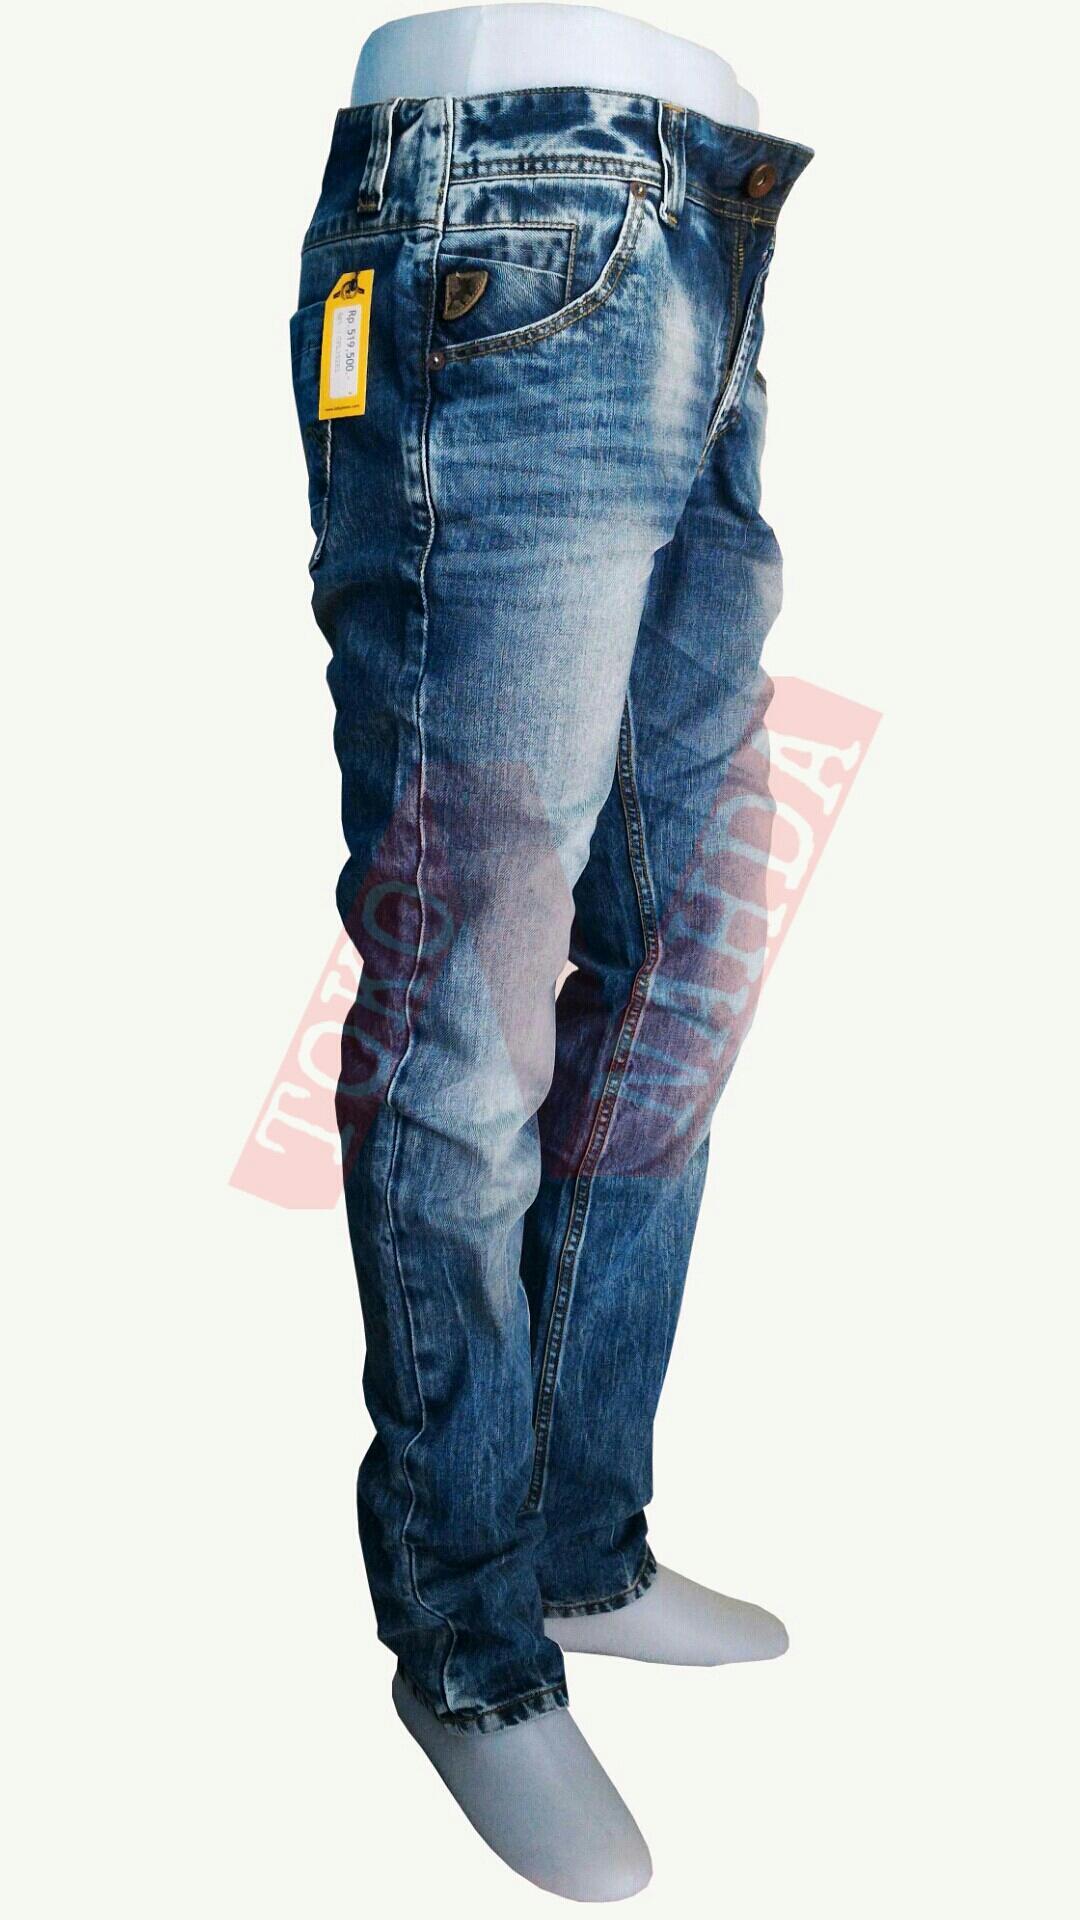 Features Celana Lois Jeans Pria Regular Fit Biru Muda Dan Harga Fashion Panjang Standar 3